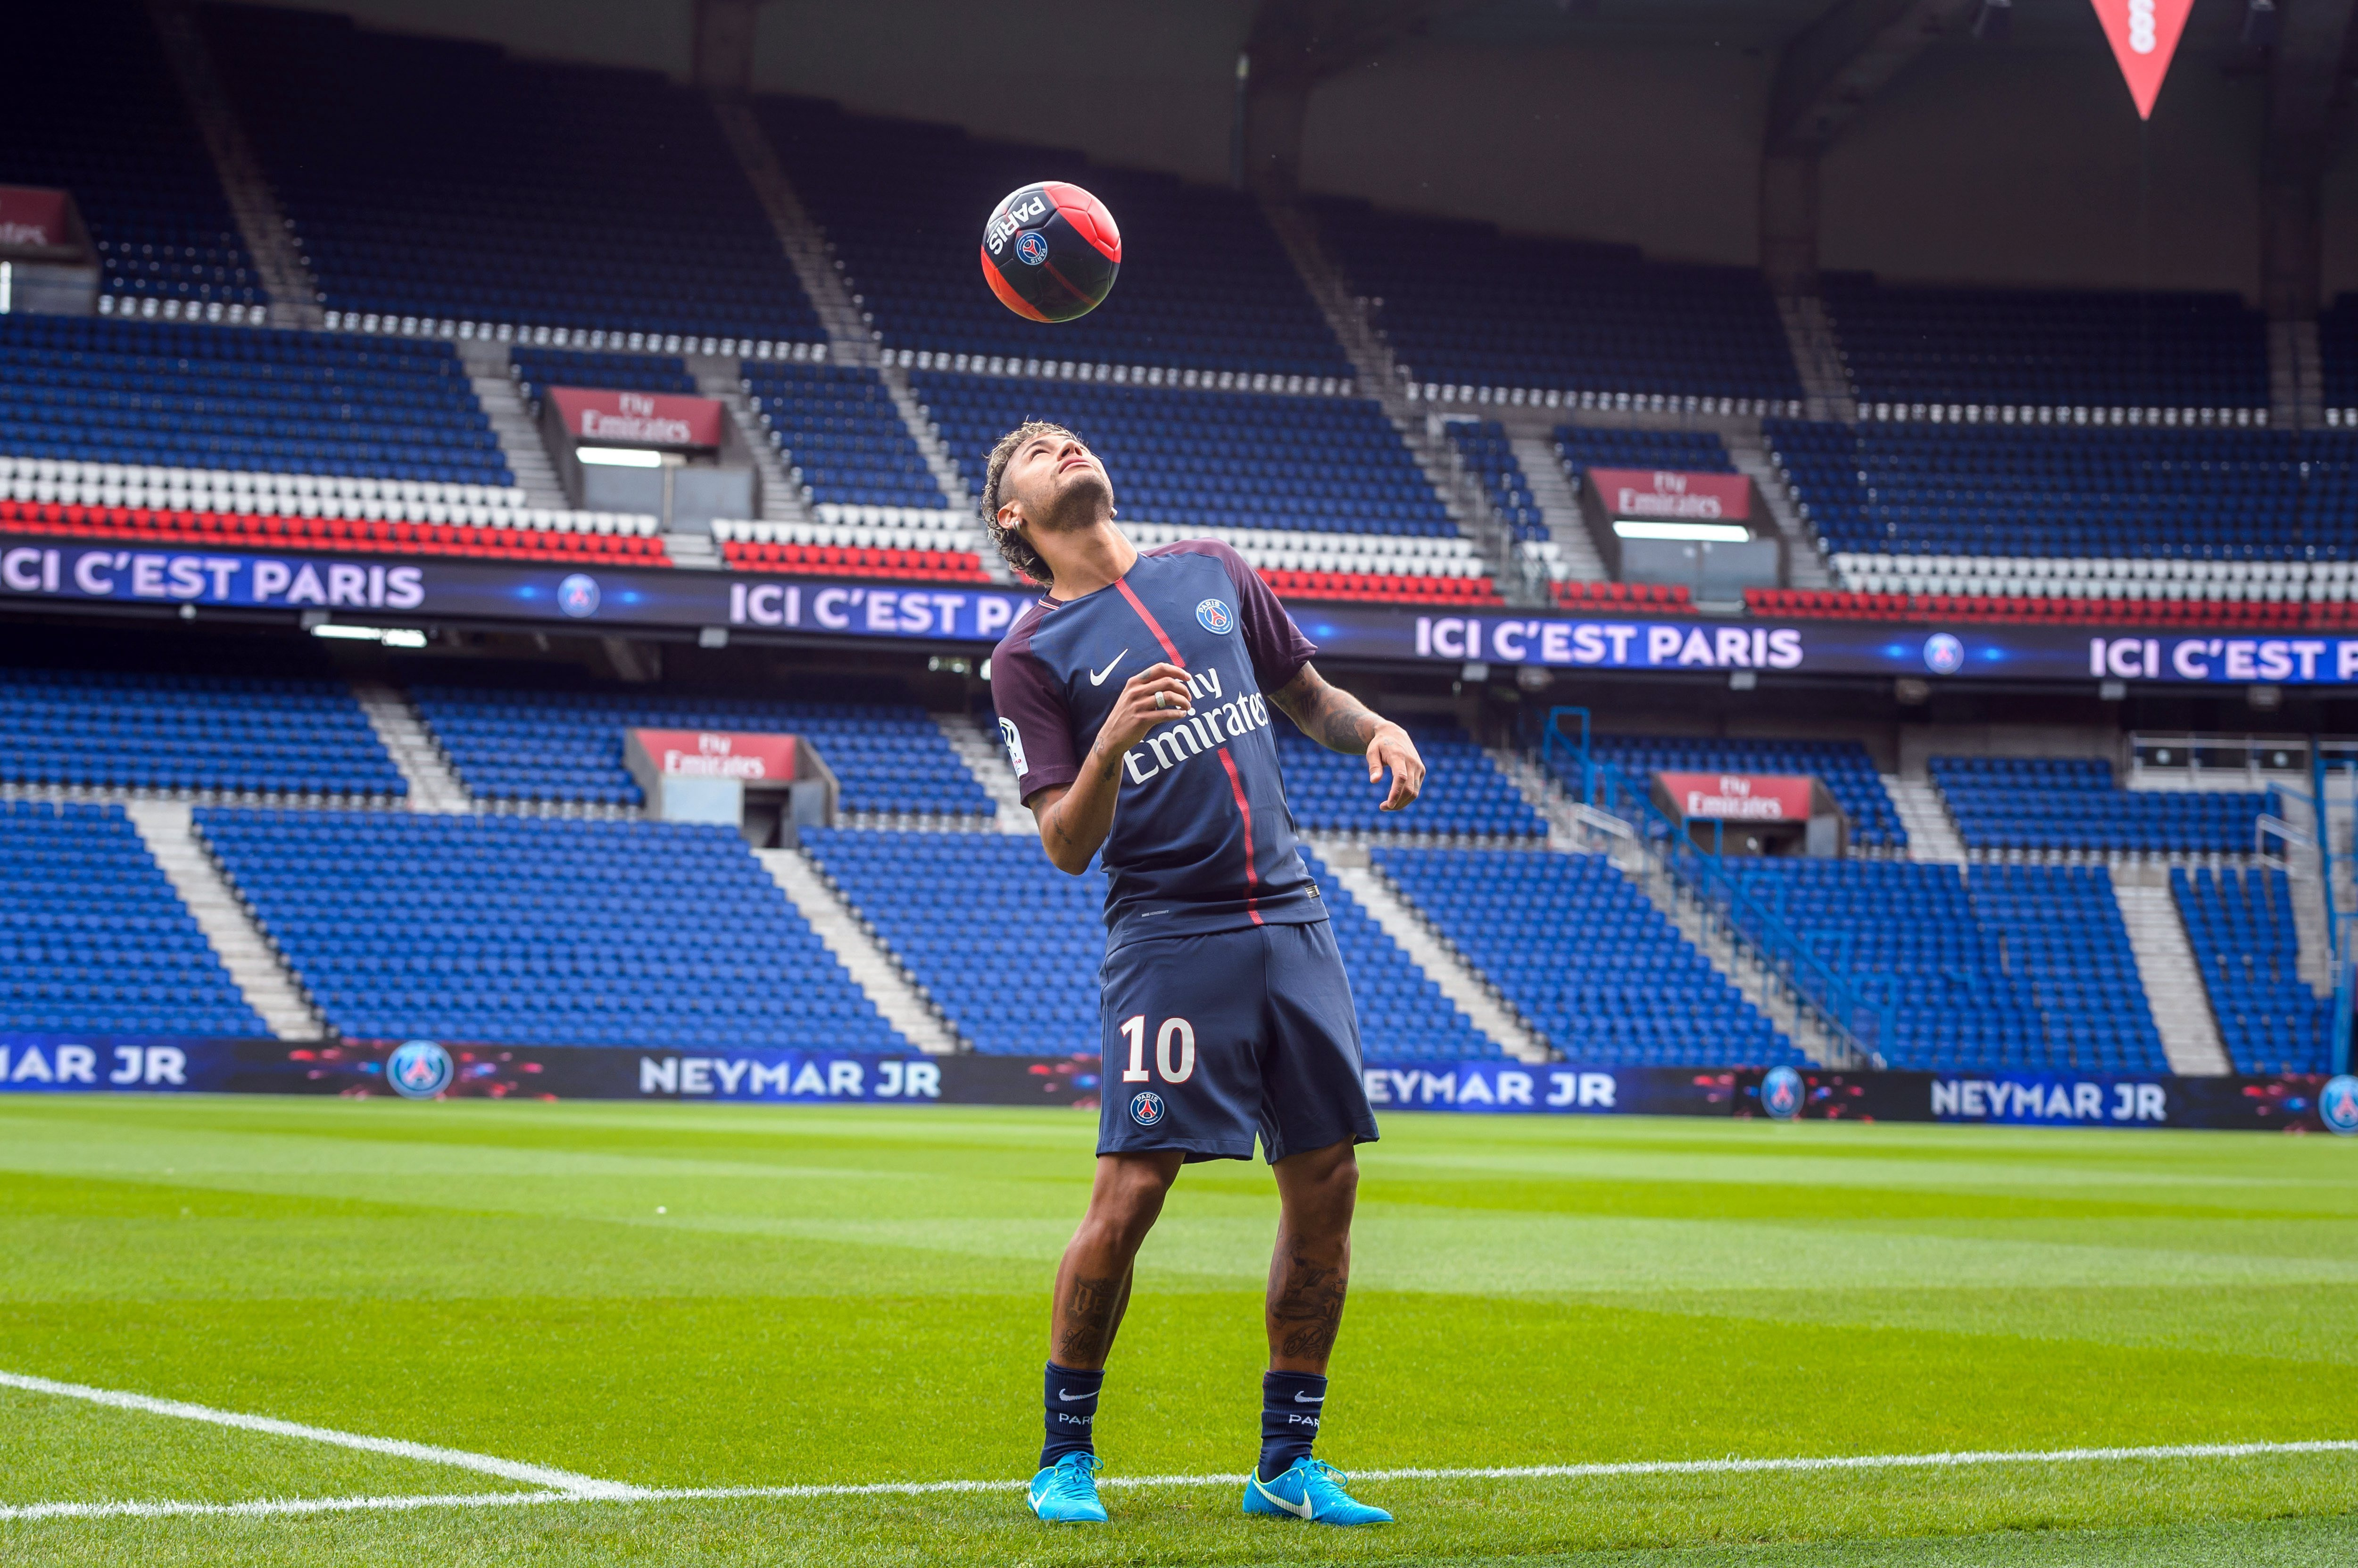 Neymar Parc Princeps presentacio PSG   EFE